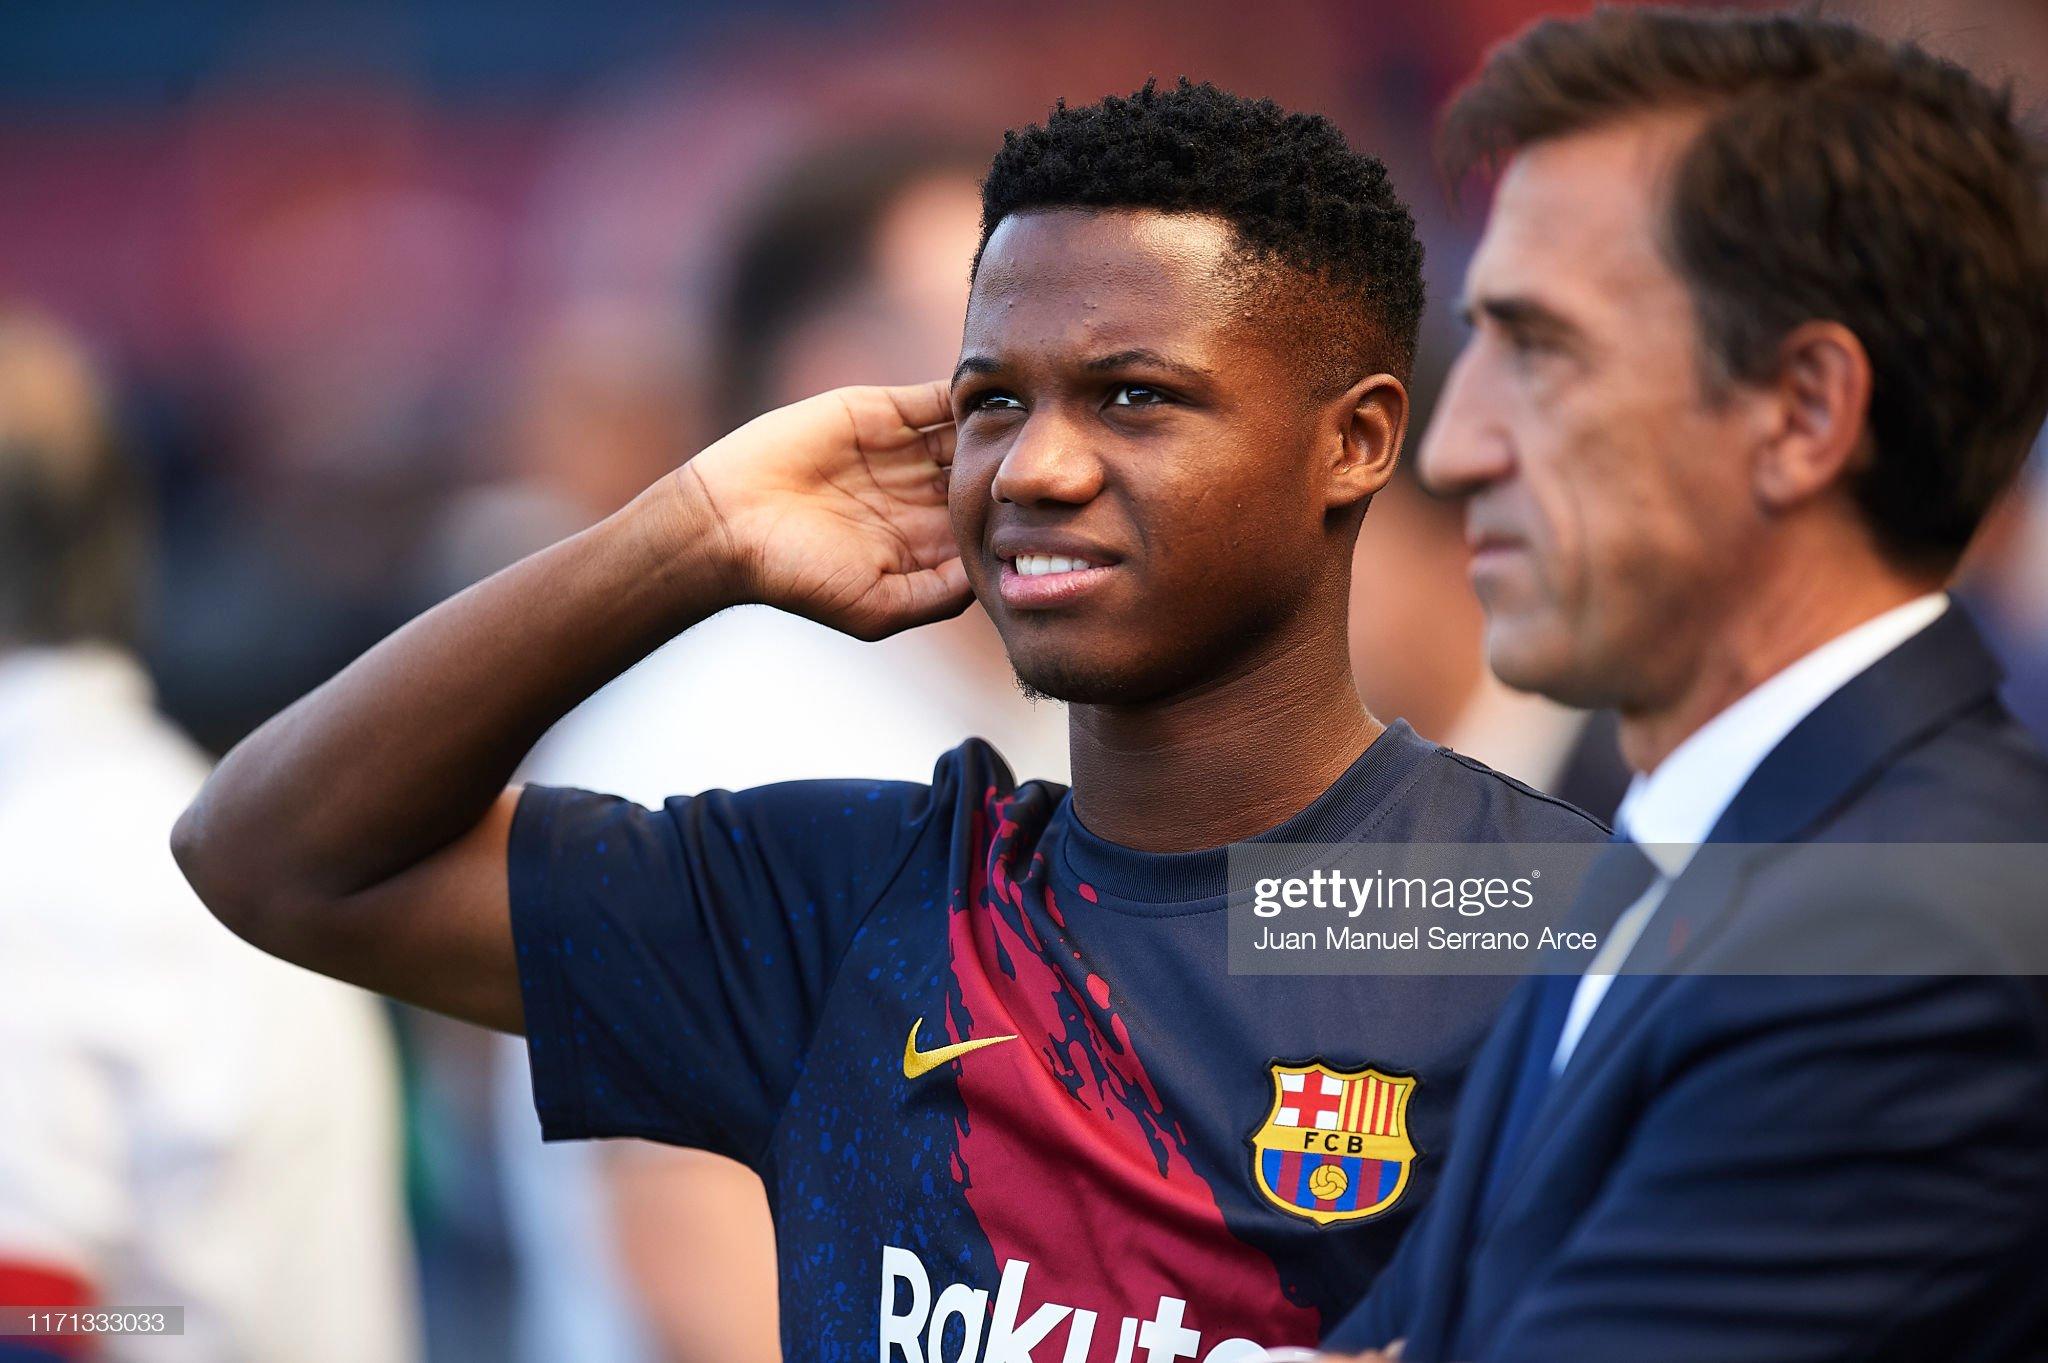 صور مباراة : أوساسونا - برشلونة 2-2 ( 31-08-2019 )  Anssumane-fati-of-fc-barcelona-looks-on-during-the-warm-up-prior-to-picture-id1171333033?s=2048x2048